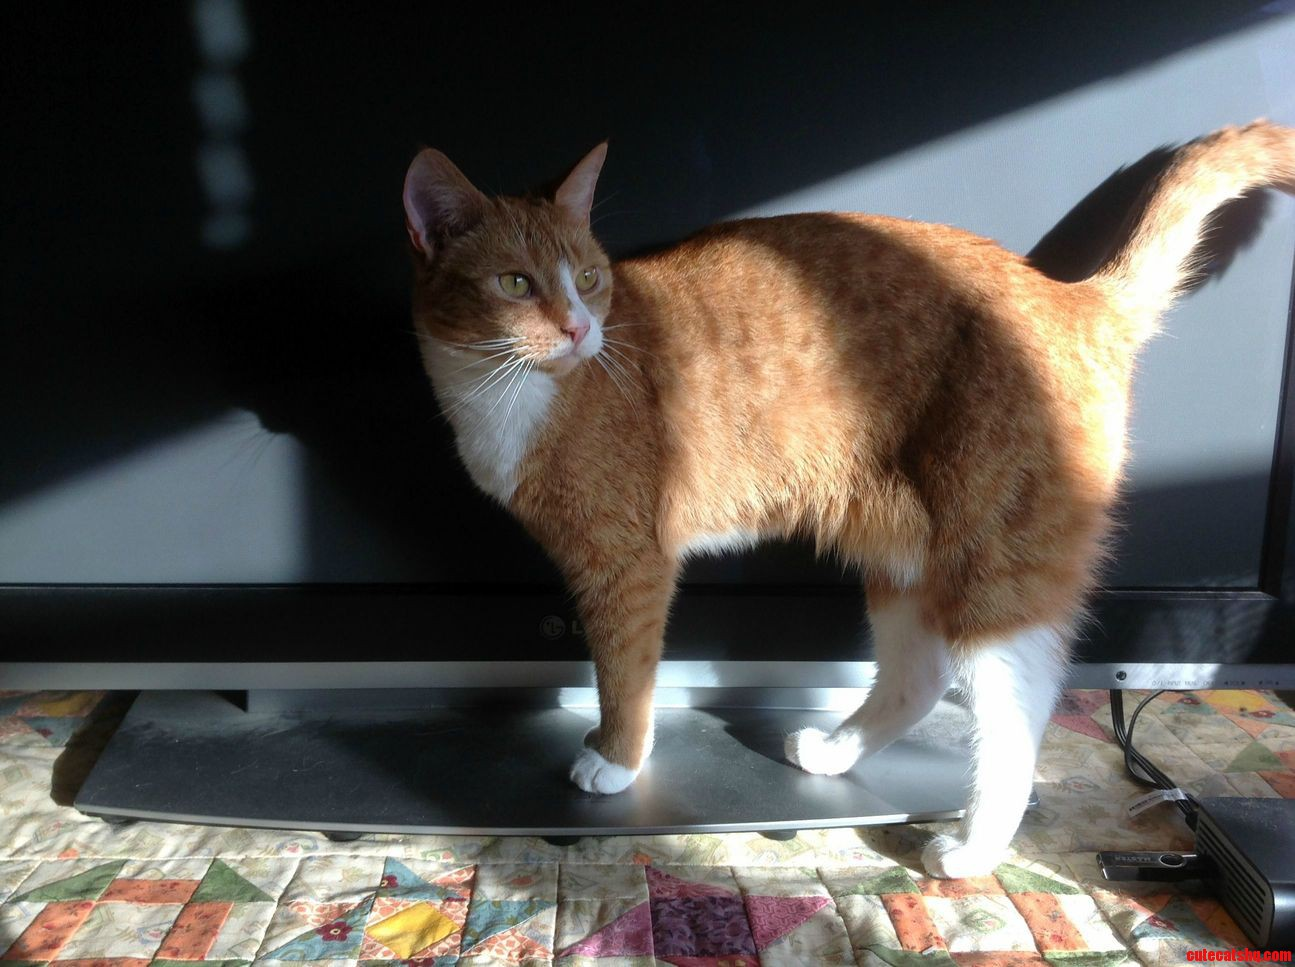 My beautiful ginger girl in the morning sun.